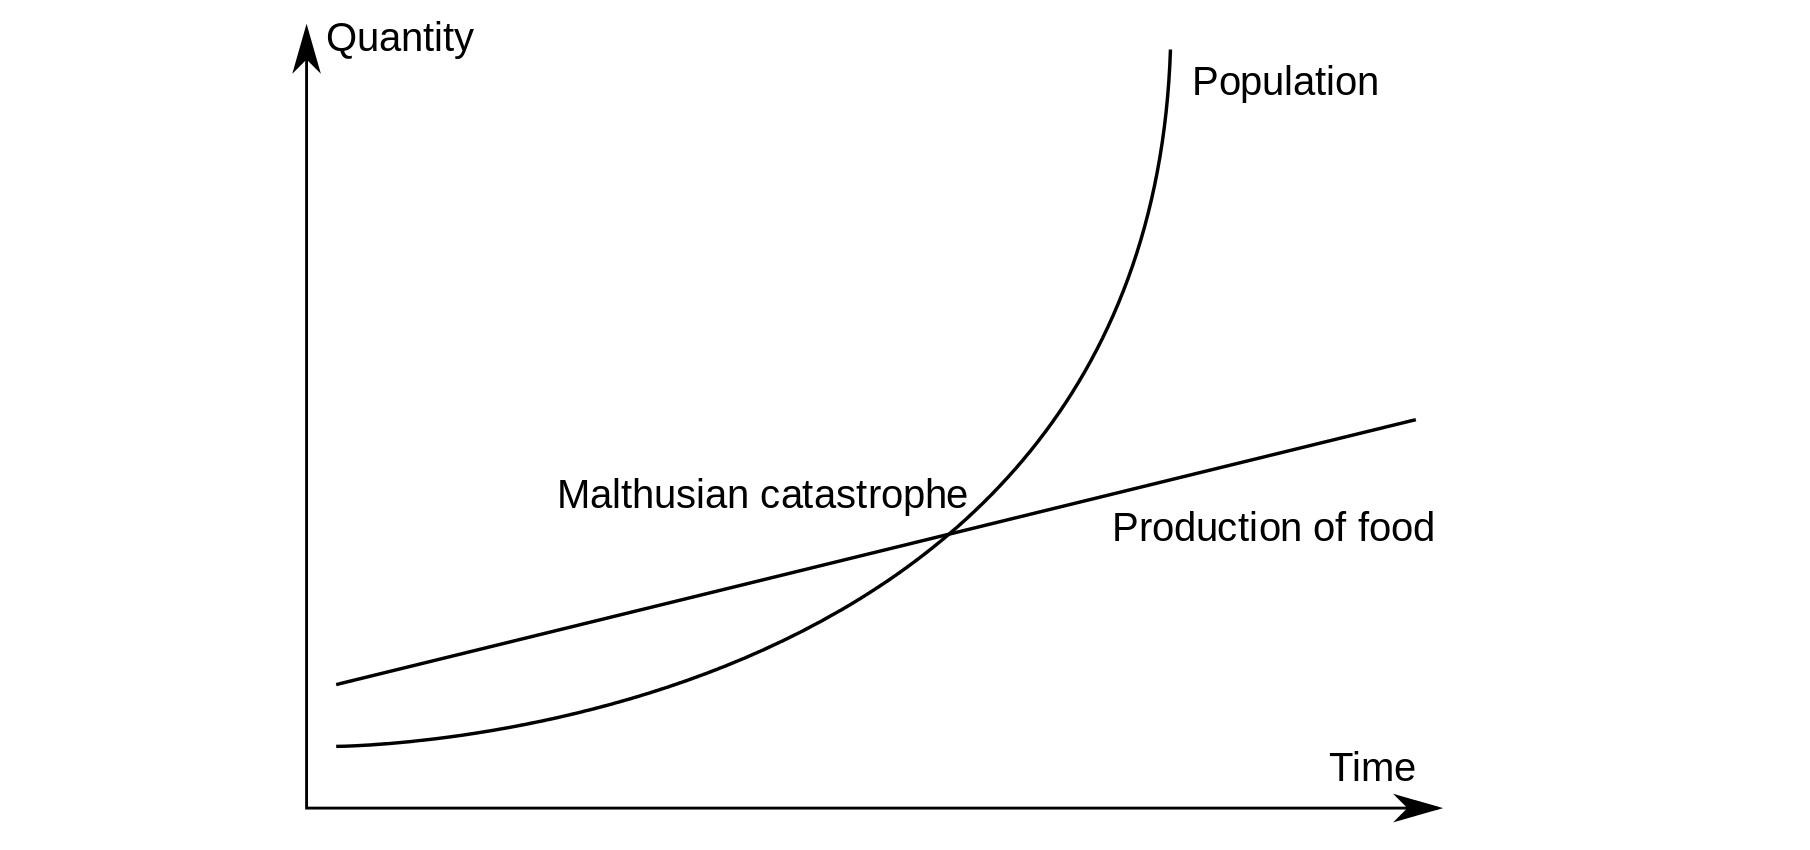 018 Essay On Population Example An The Principle Impressive Control Explosion In Kannada Pakistan Full